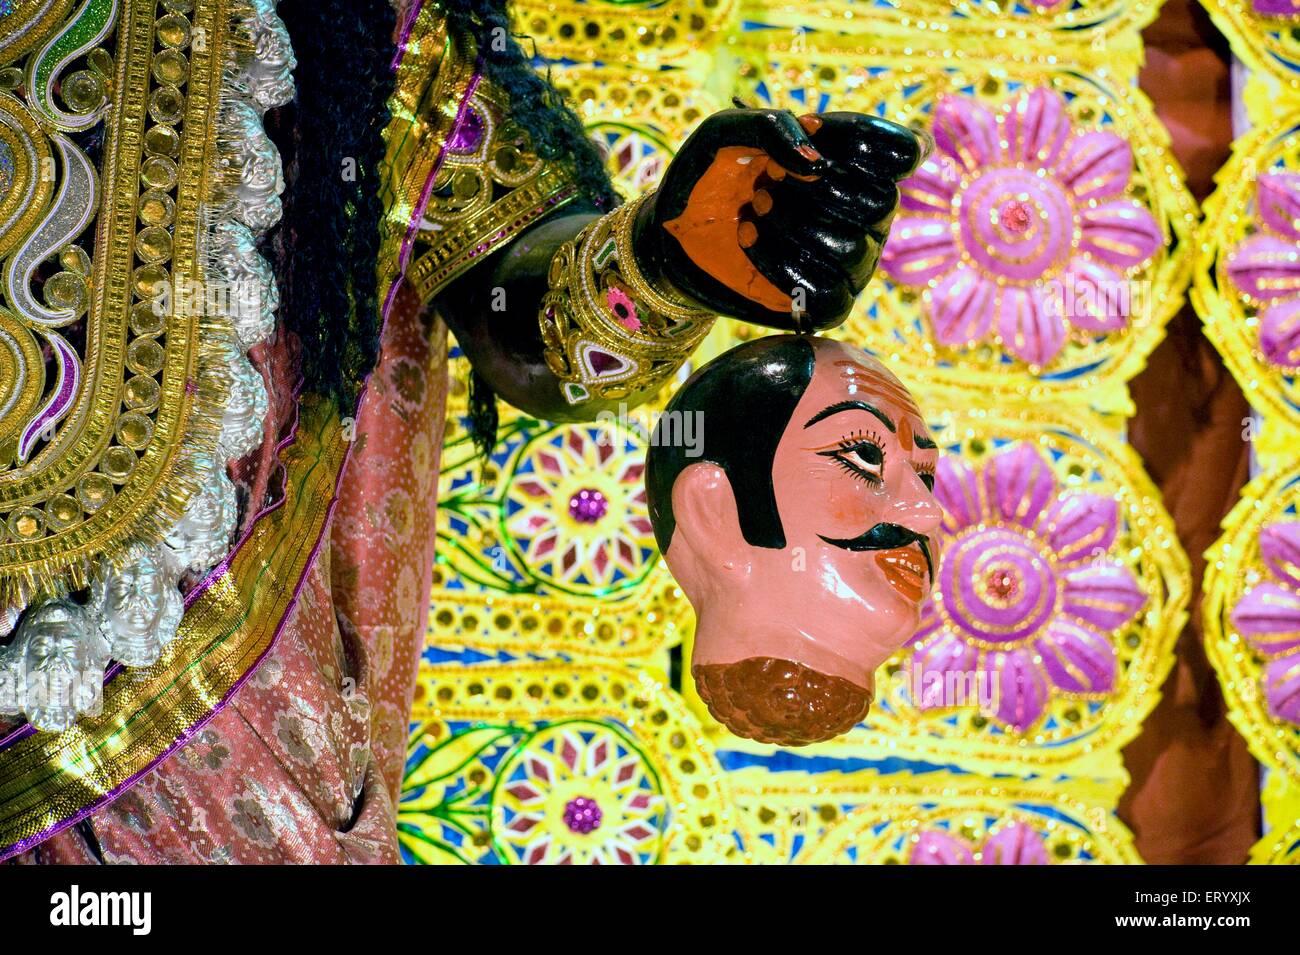 Colgando de la cabeza humana de la mano de la diosa Kali puja Calcuta ; ; ; en Bengala Occidental, India Imagen De Stock